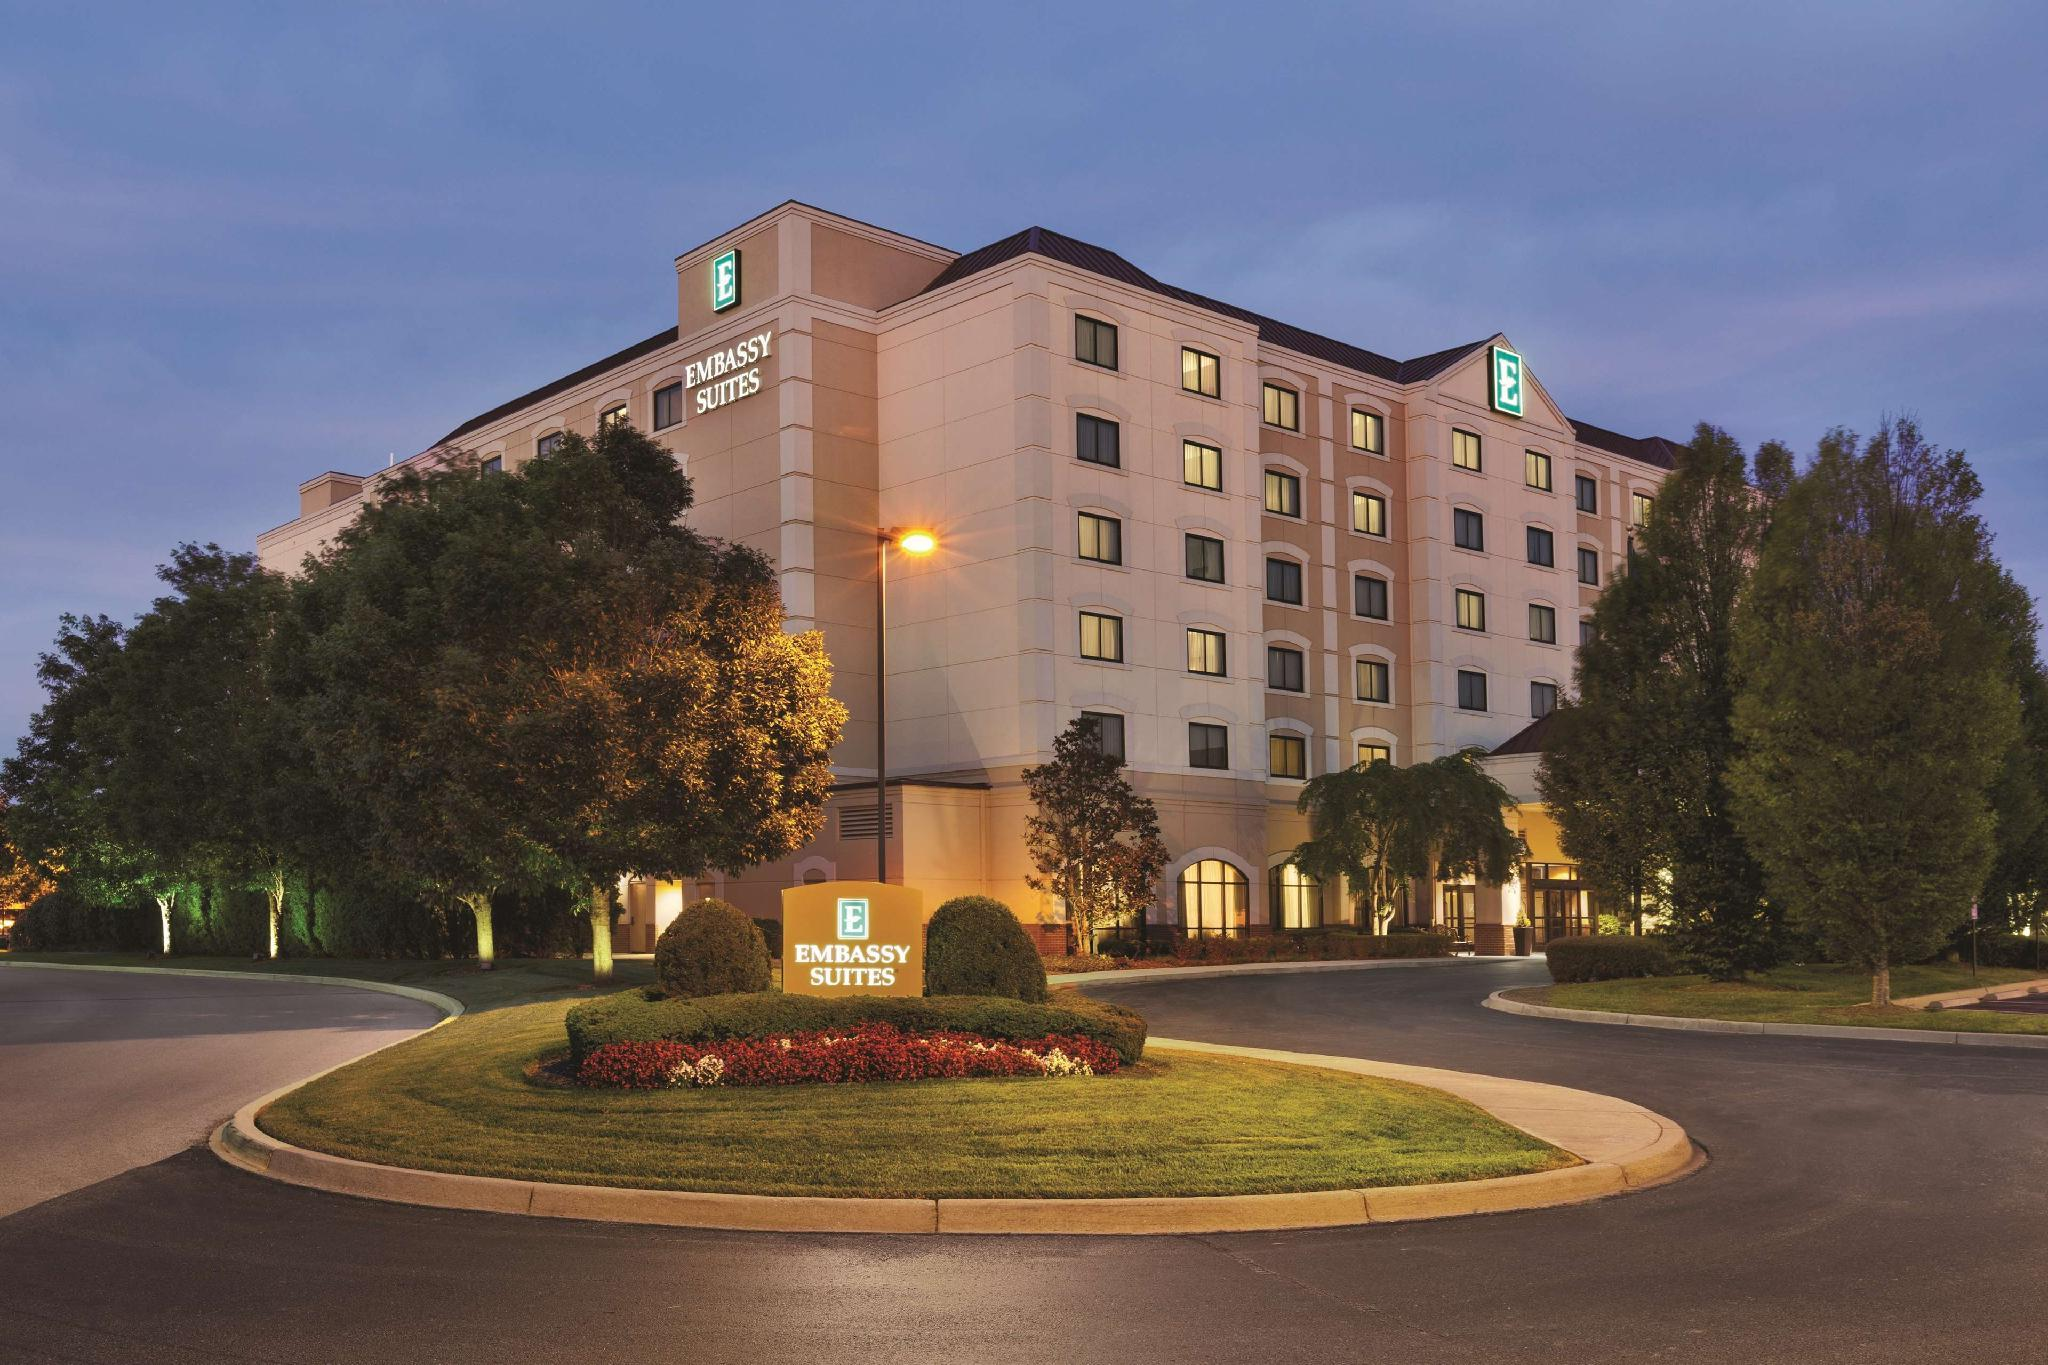 Embassy Suites Louisville image